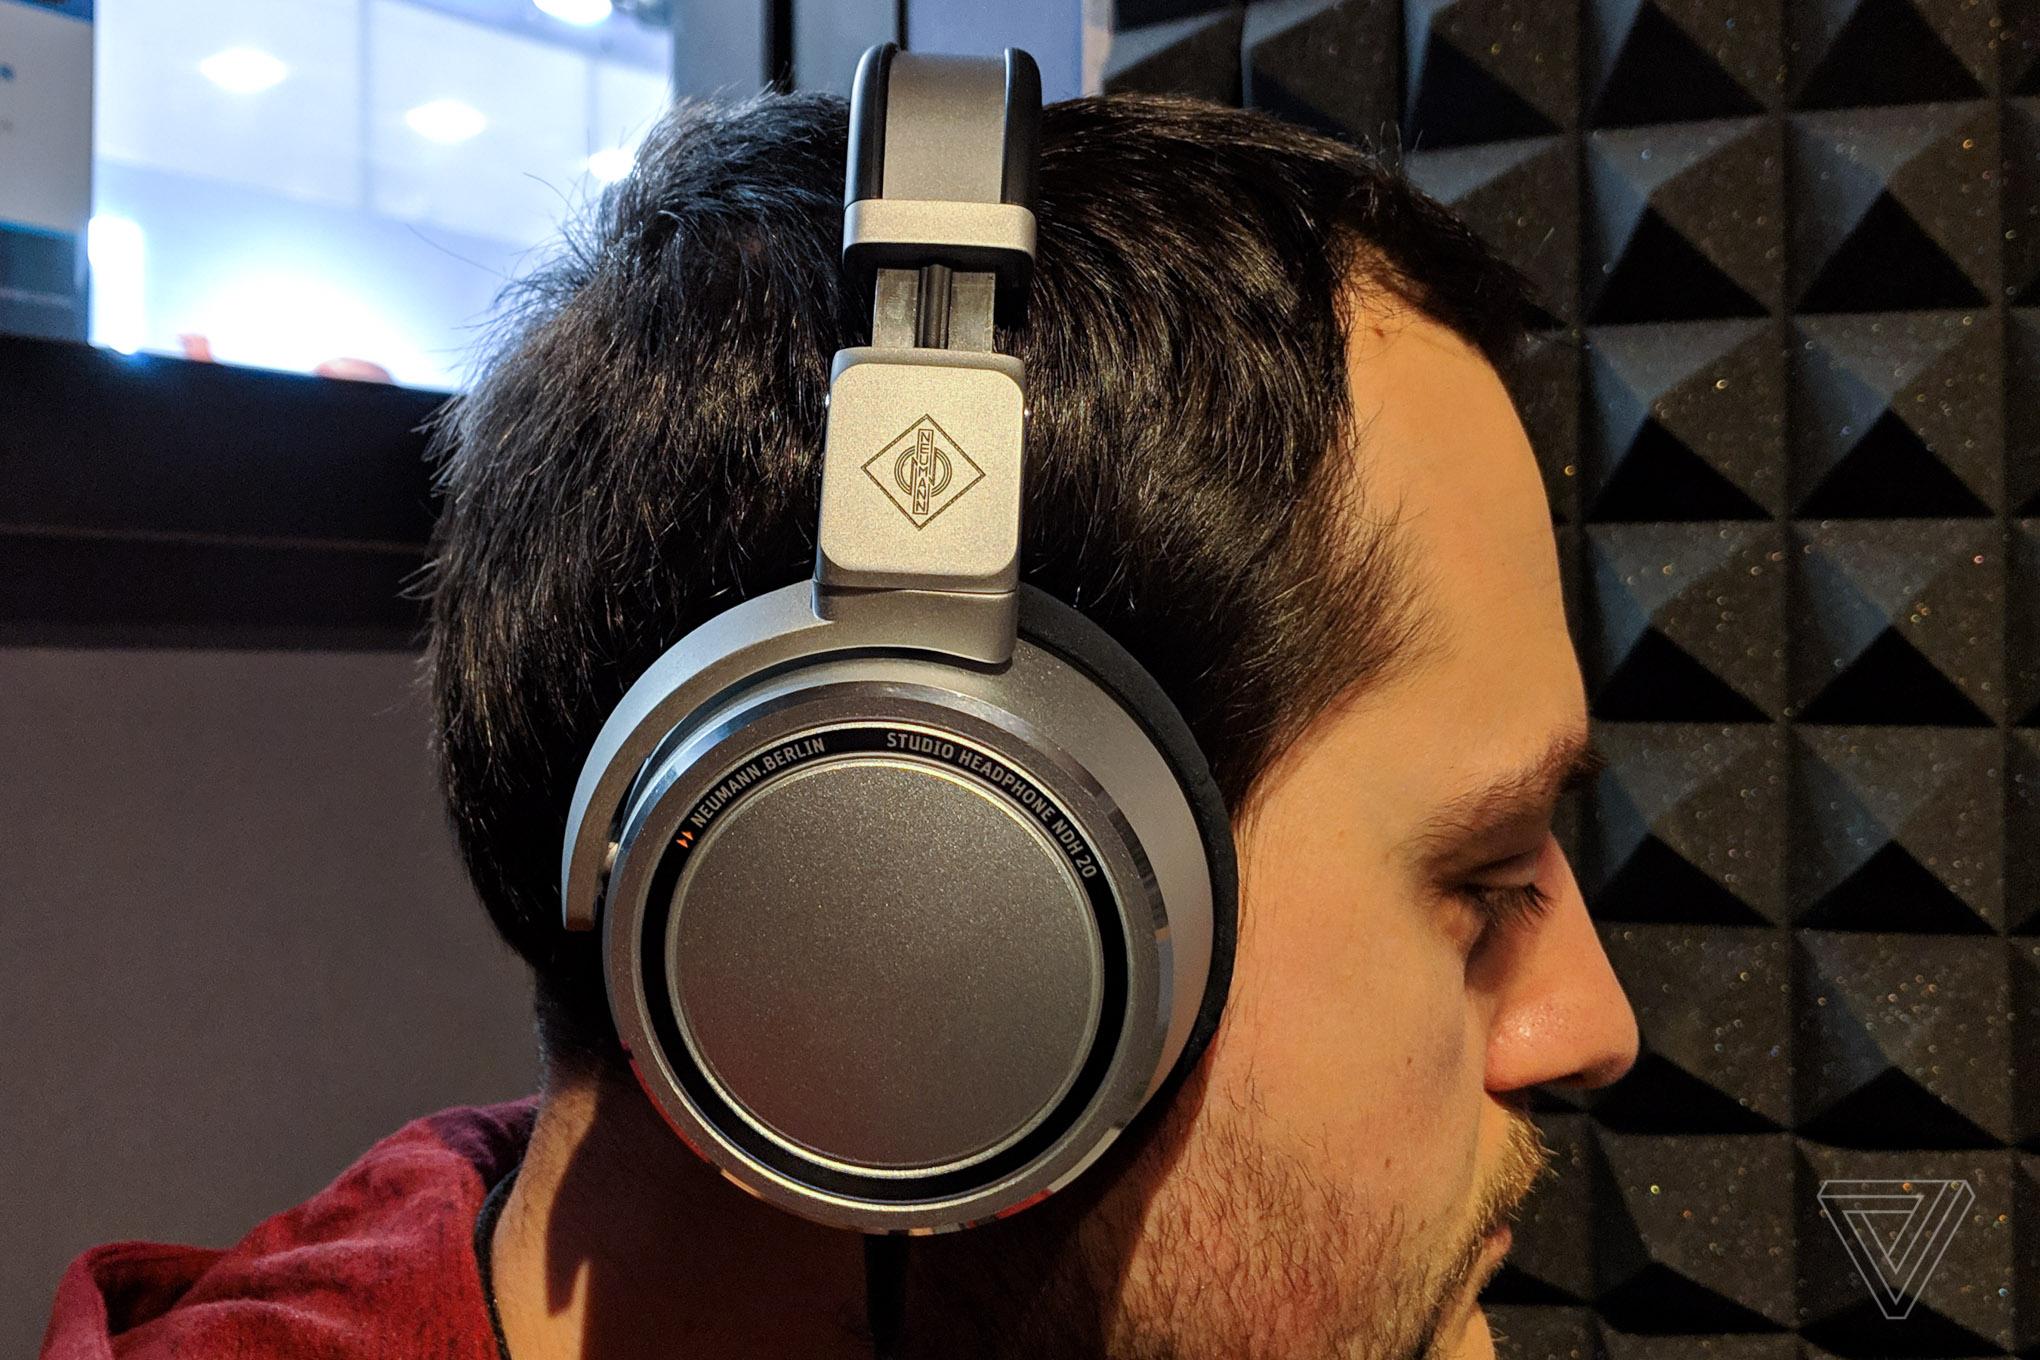 22eddd3168d Neumann's pro studio headphones aren't for audiophiles, but I like them  anyway